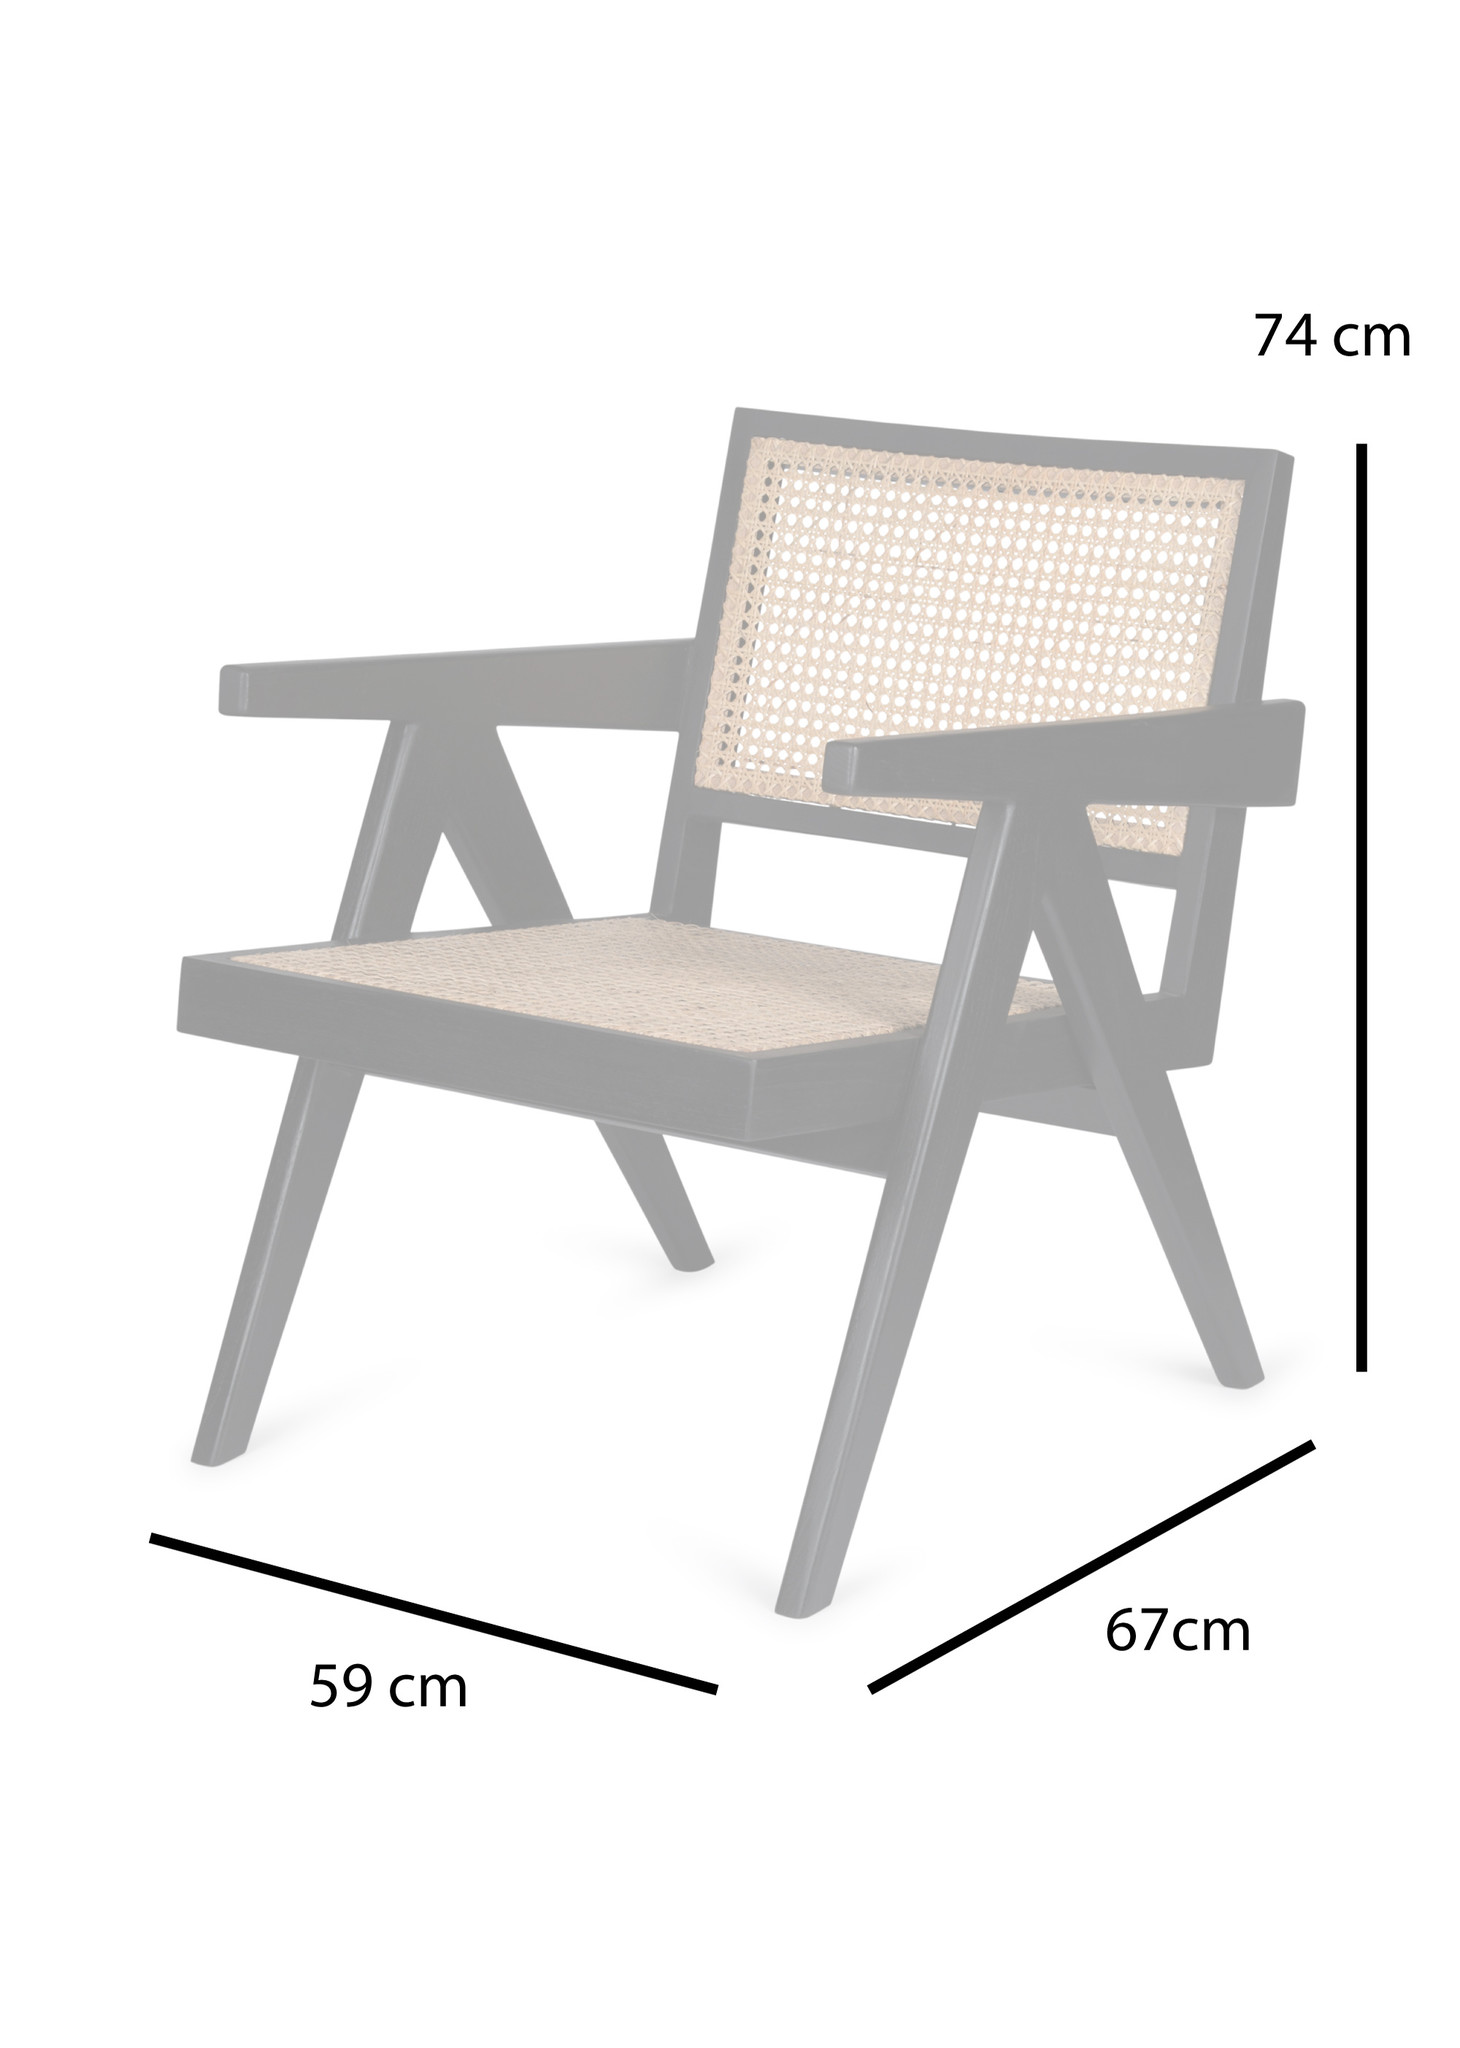 Easy Lounge Chair - Darkened Teak-5